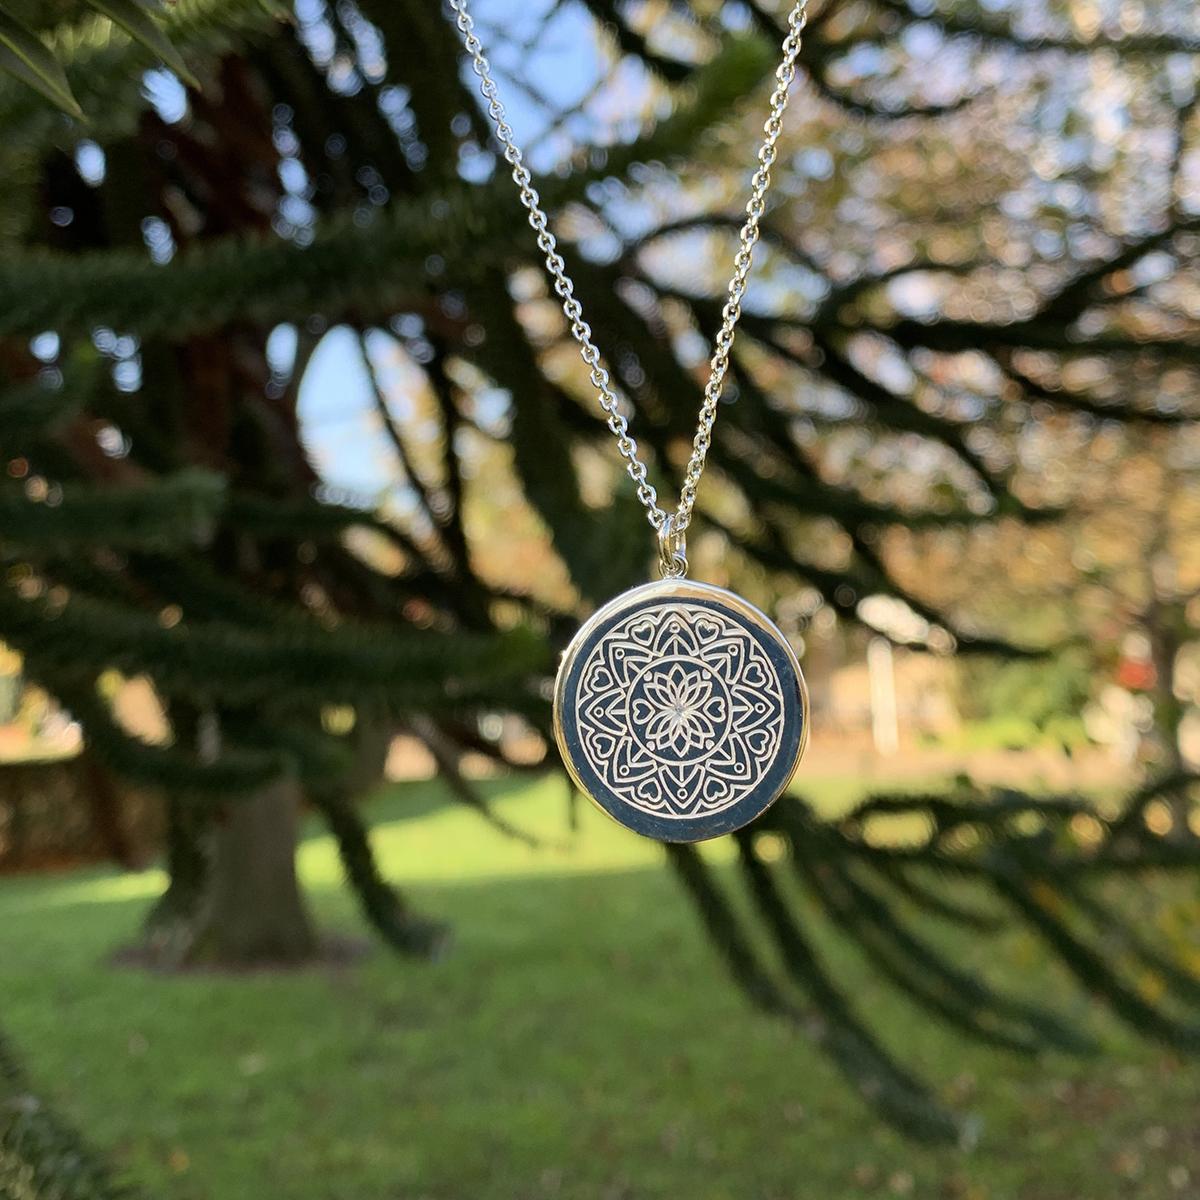 Engravable Love Mandala Necklace Photoshoot